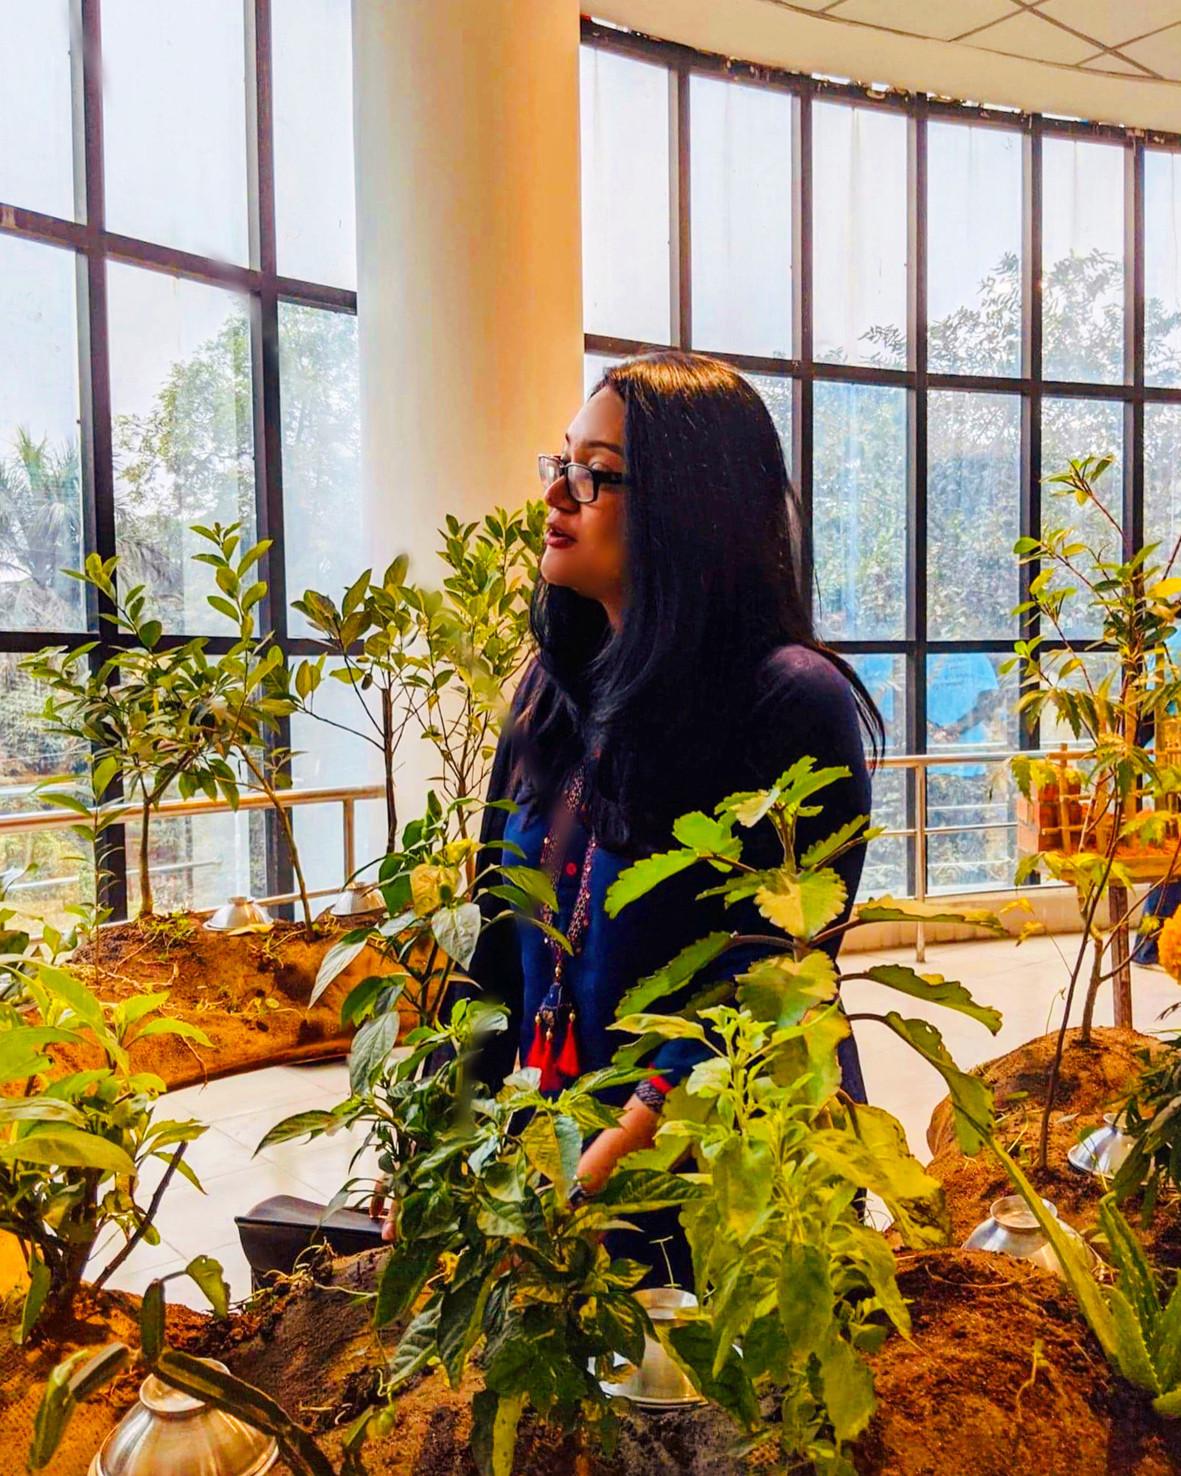 Ashna Afroze Ahmed at Dhaka Art summit at Otobong's Landversation table of plants and flowers